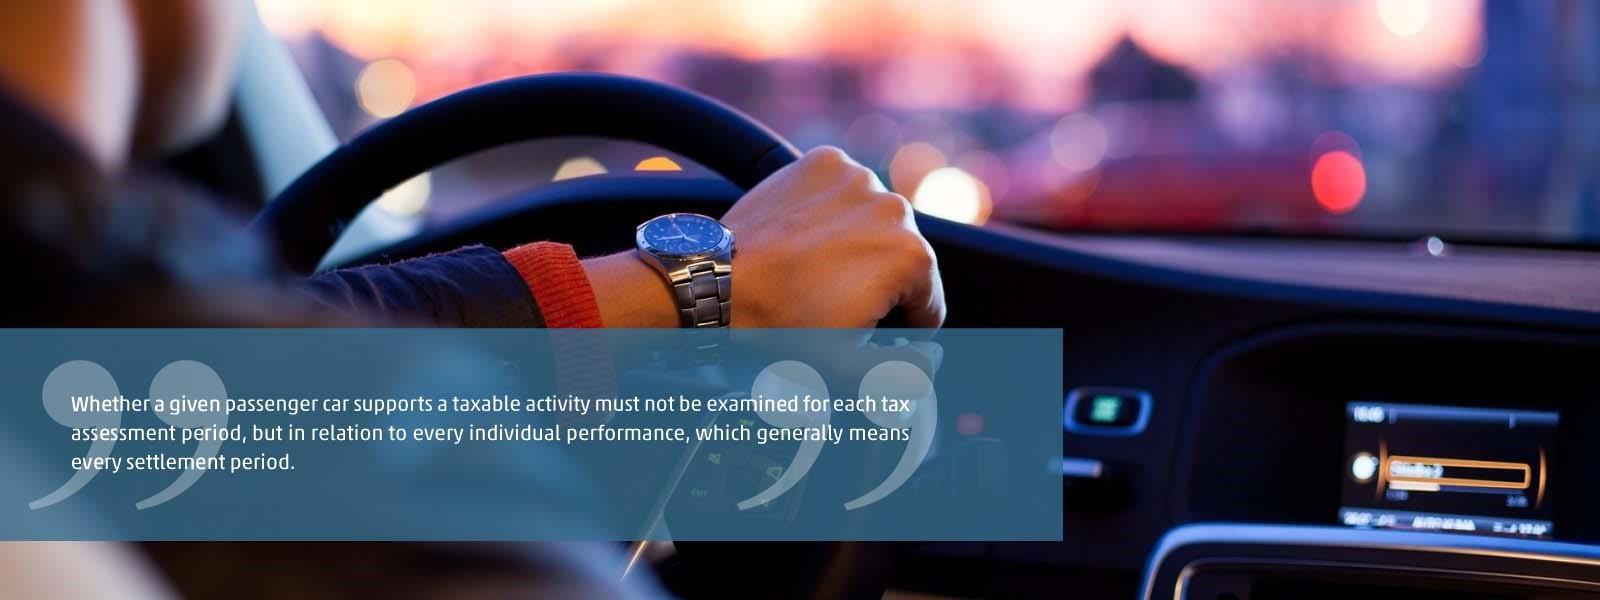 Tax issues regarding company cars